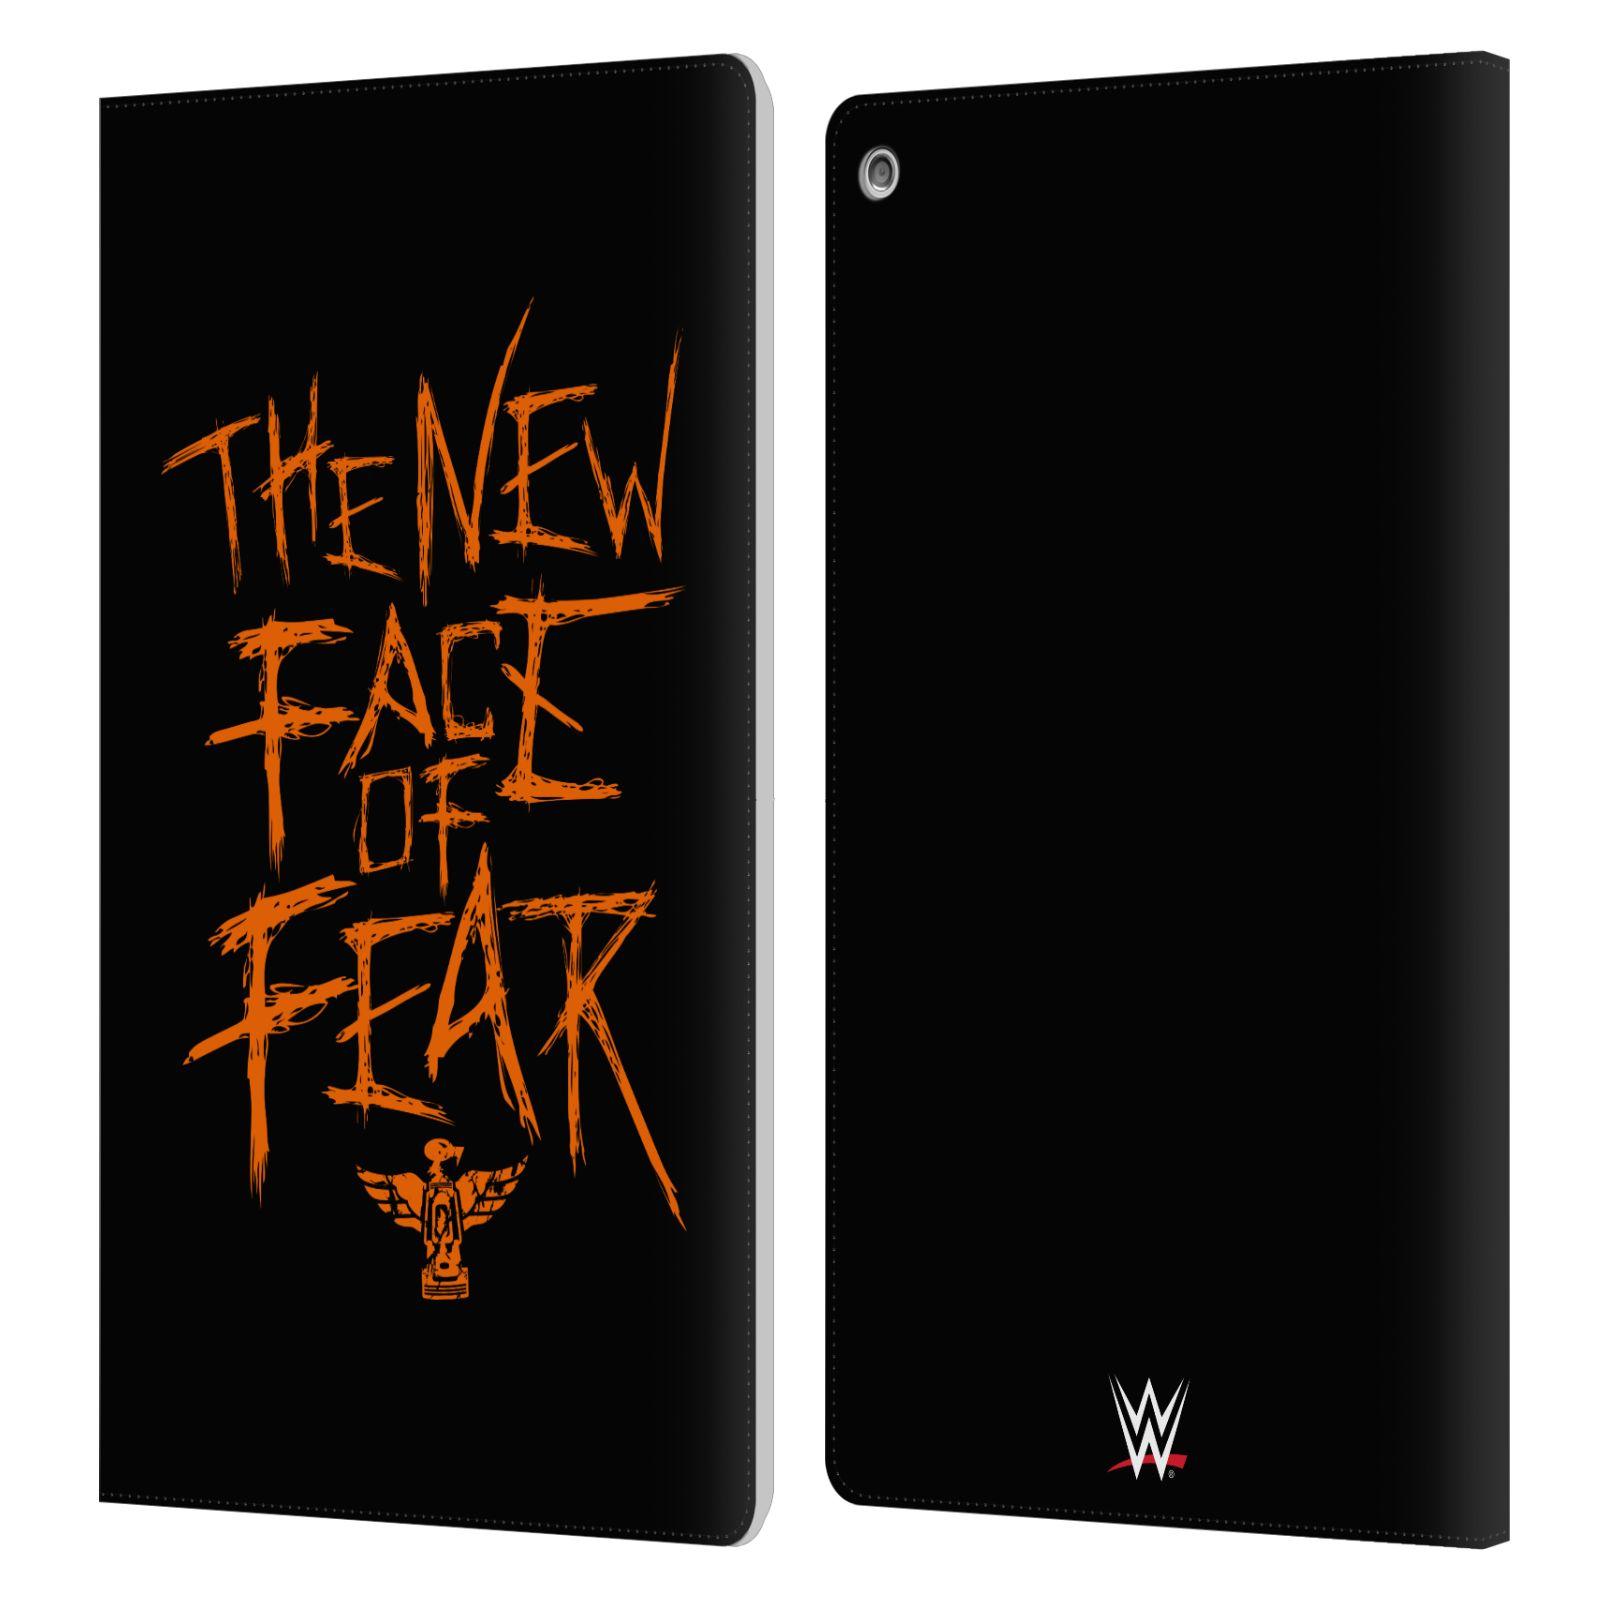 Fire HD 8 2015 2017 2018 Plus 国内送料無料 2020 Kindle HDX 8.9 WYATT Paperwhite レザー手帳型ウォレットタイプケース 3 Amazon 1 オフィシャル BRAY 2 国内正規総代理店アイテム WWE